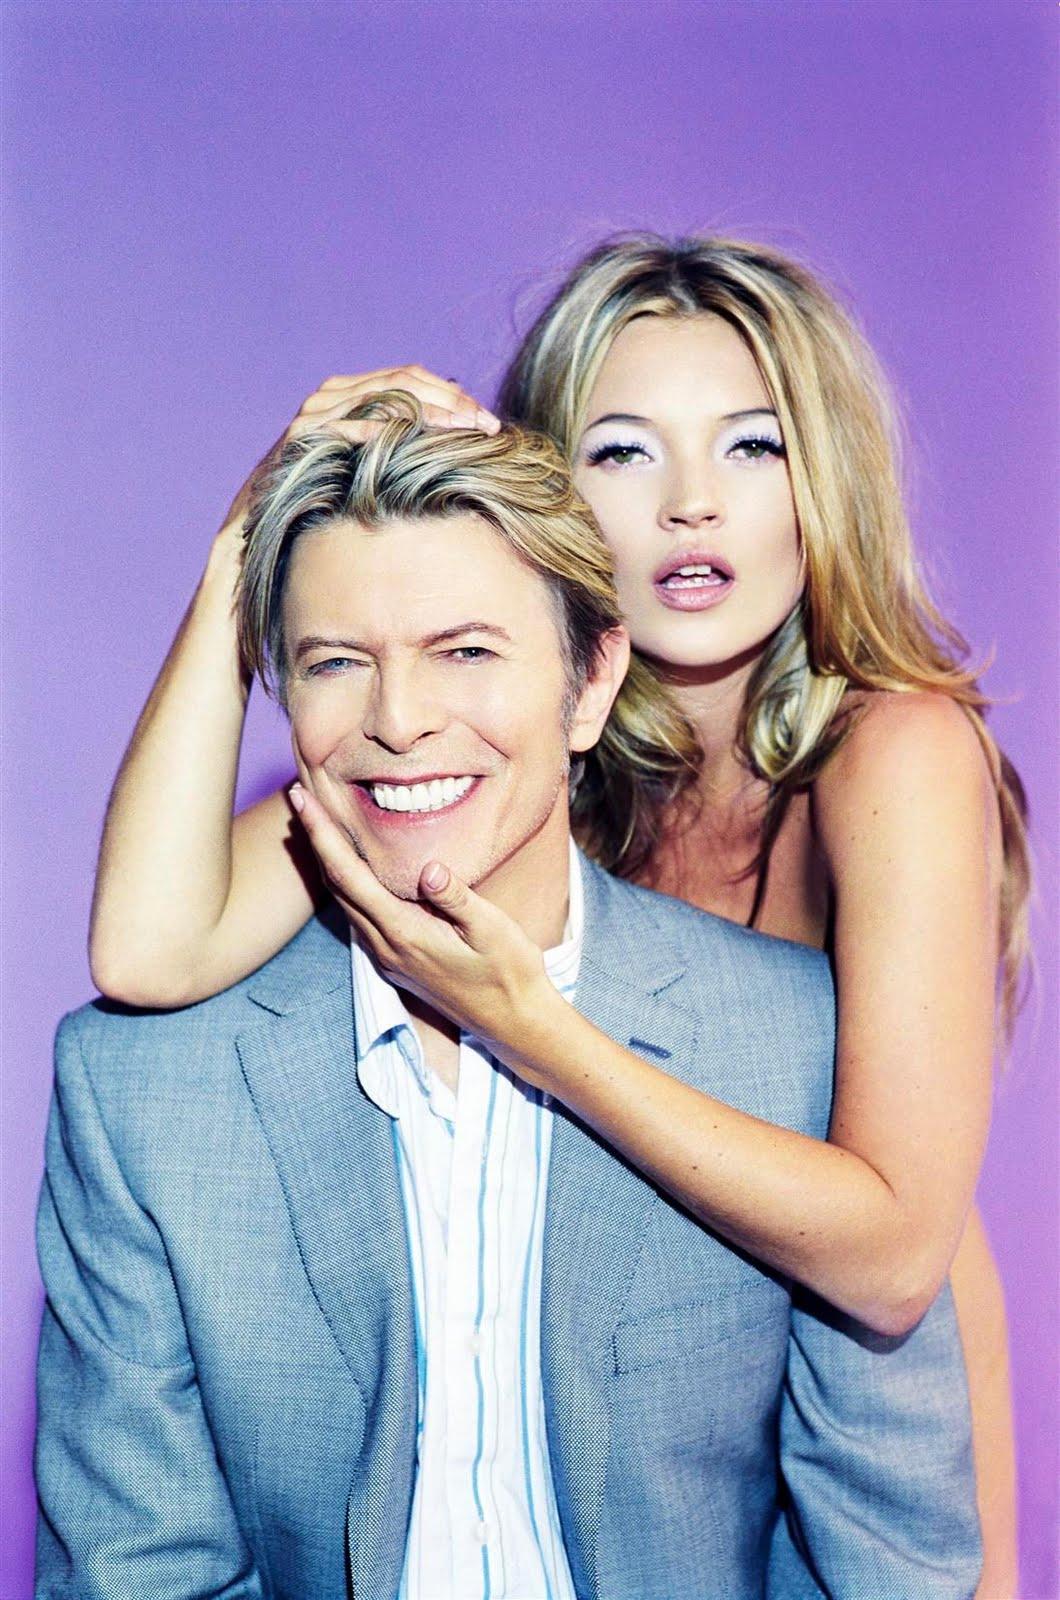 http://4.bp.blogspot.com/-zv7BpGPxmZY/TgoAmJtnuFI/AAAAAAAAGgc/i8qvOu8tN-M/s1600/Kate_Moss_and_David_Bowie_Ellen_von_Unwerth_Photoshoot_2003_03_122_554lo.jpg